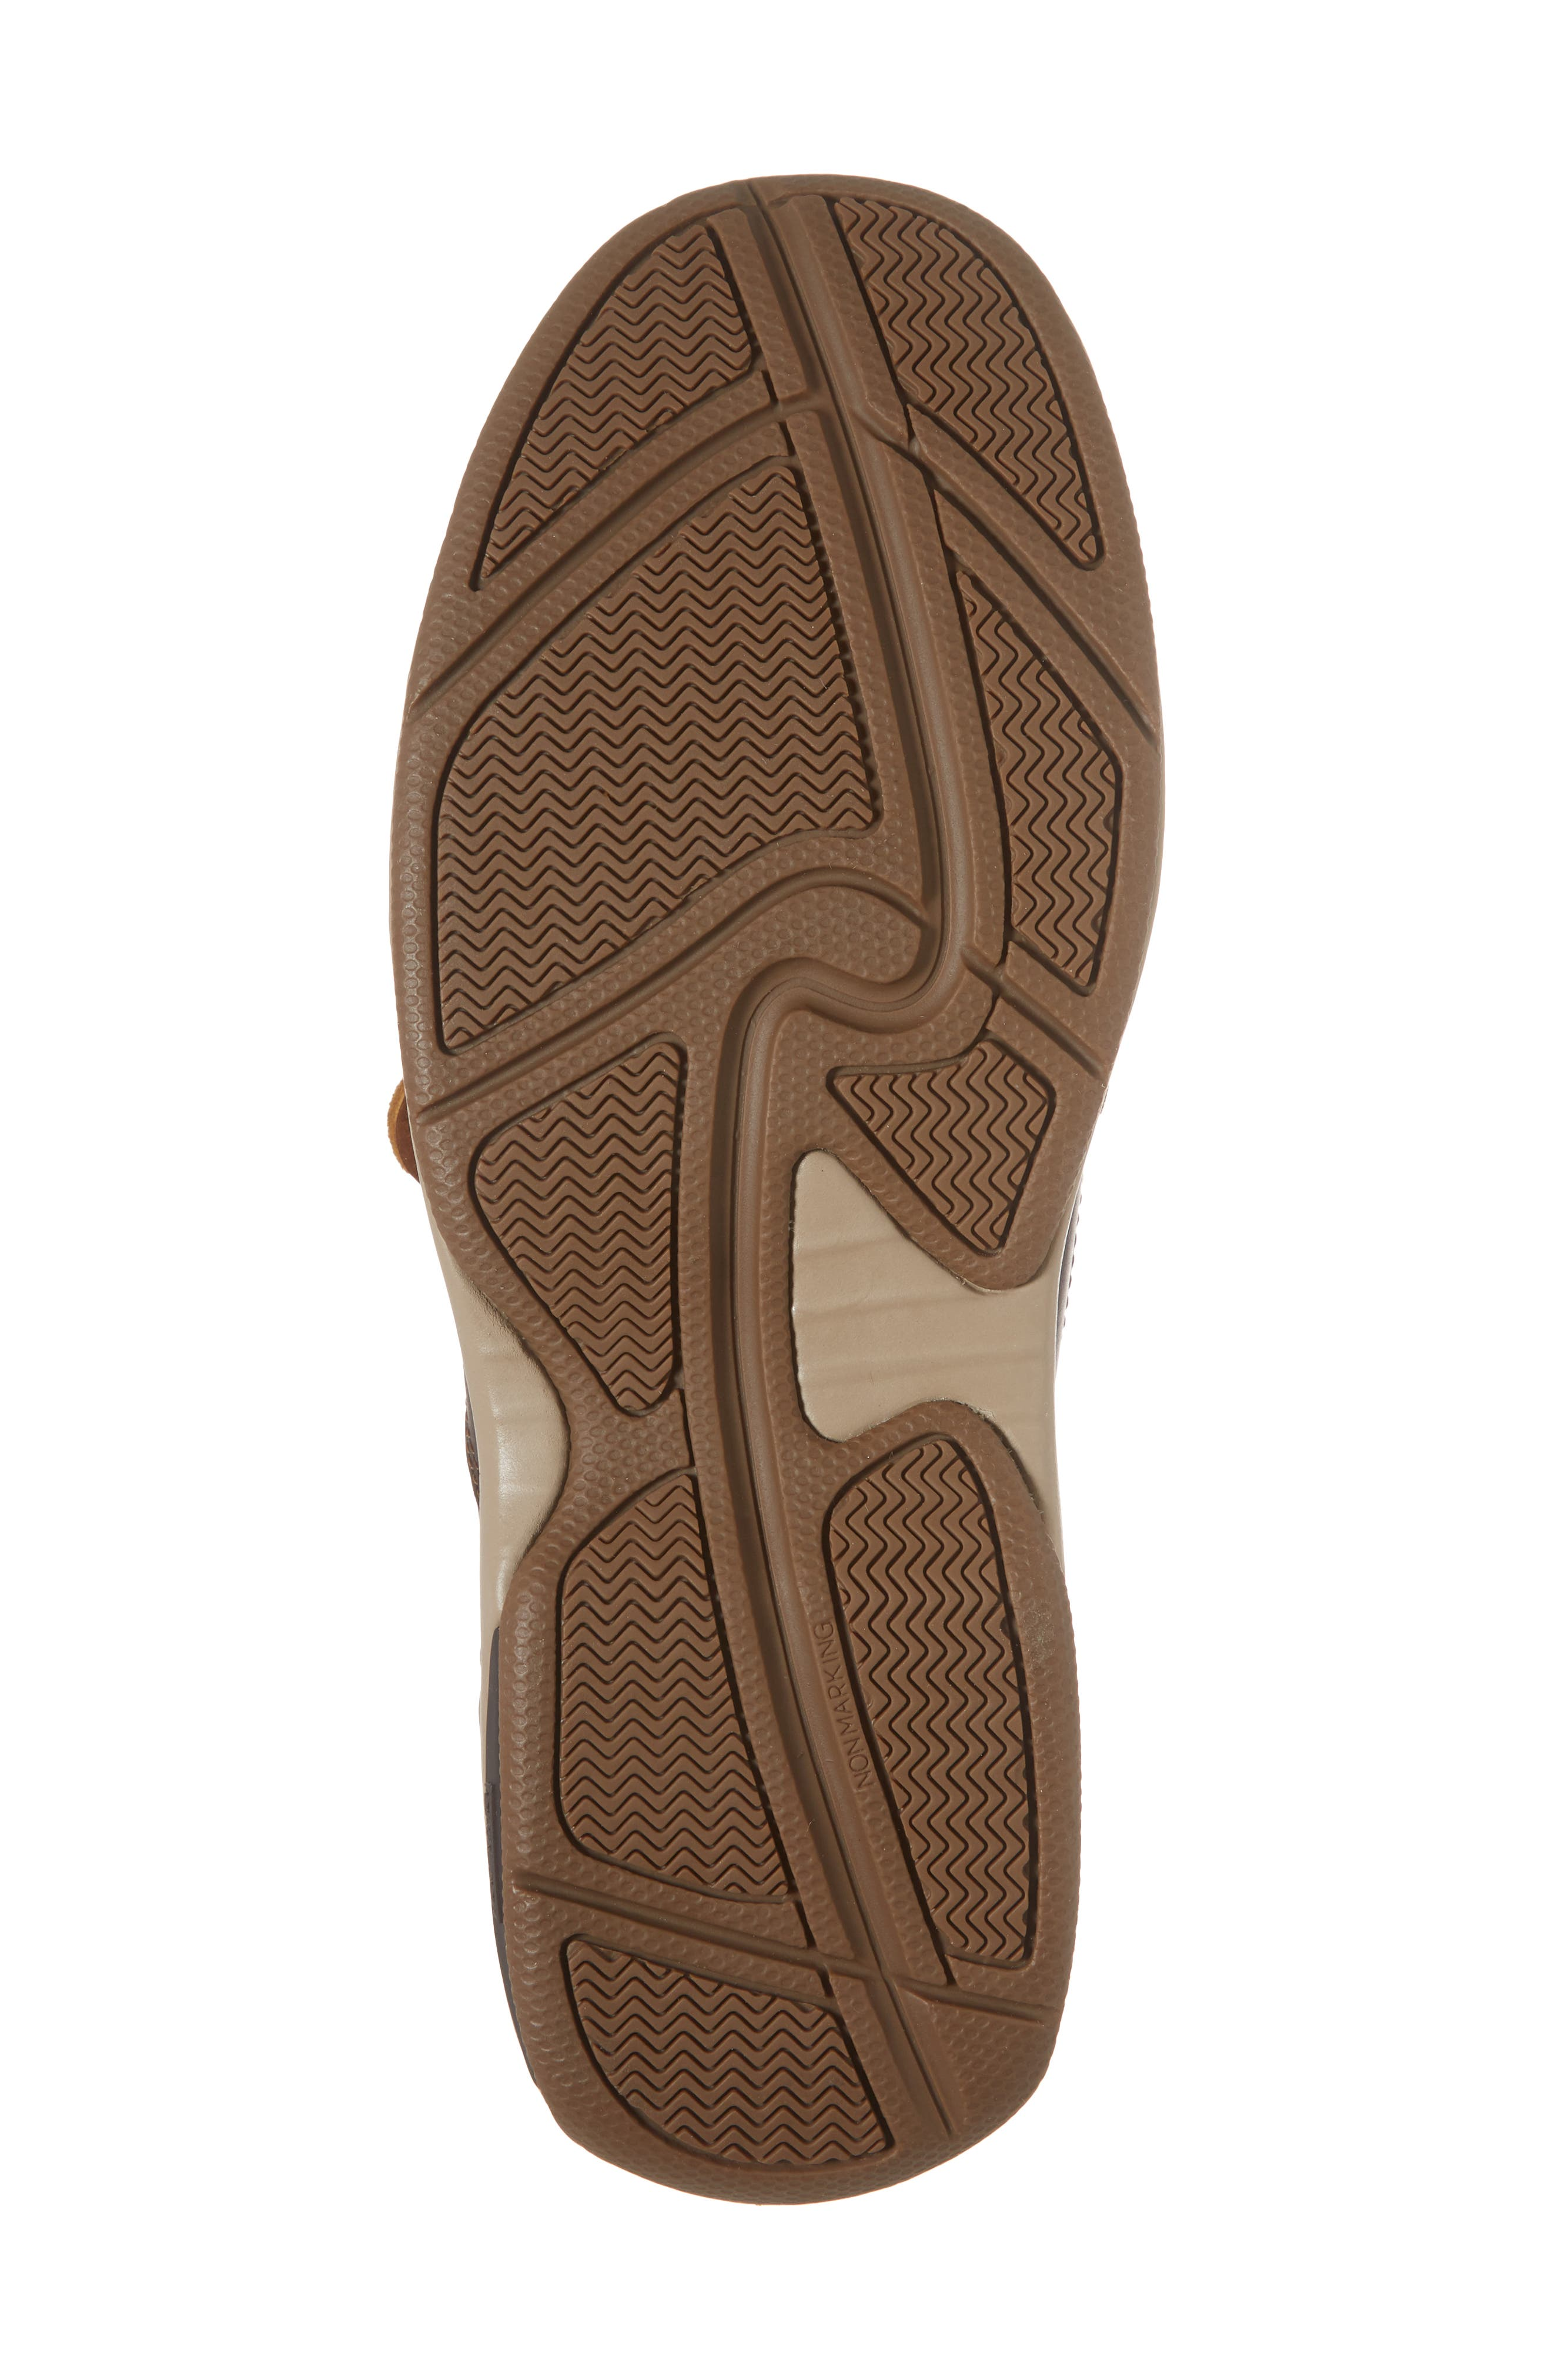 LTD Water Resistant Boat Shoe,                             Alternate thumbnail 6, color,                             Tan Leather